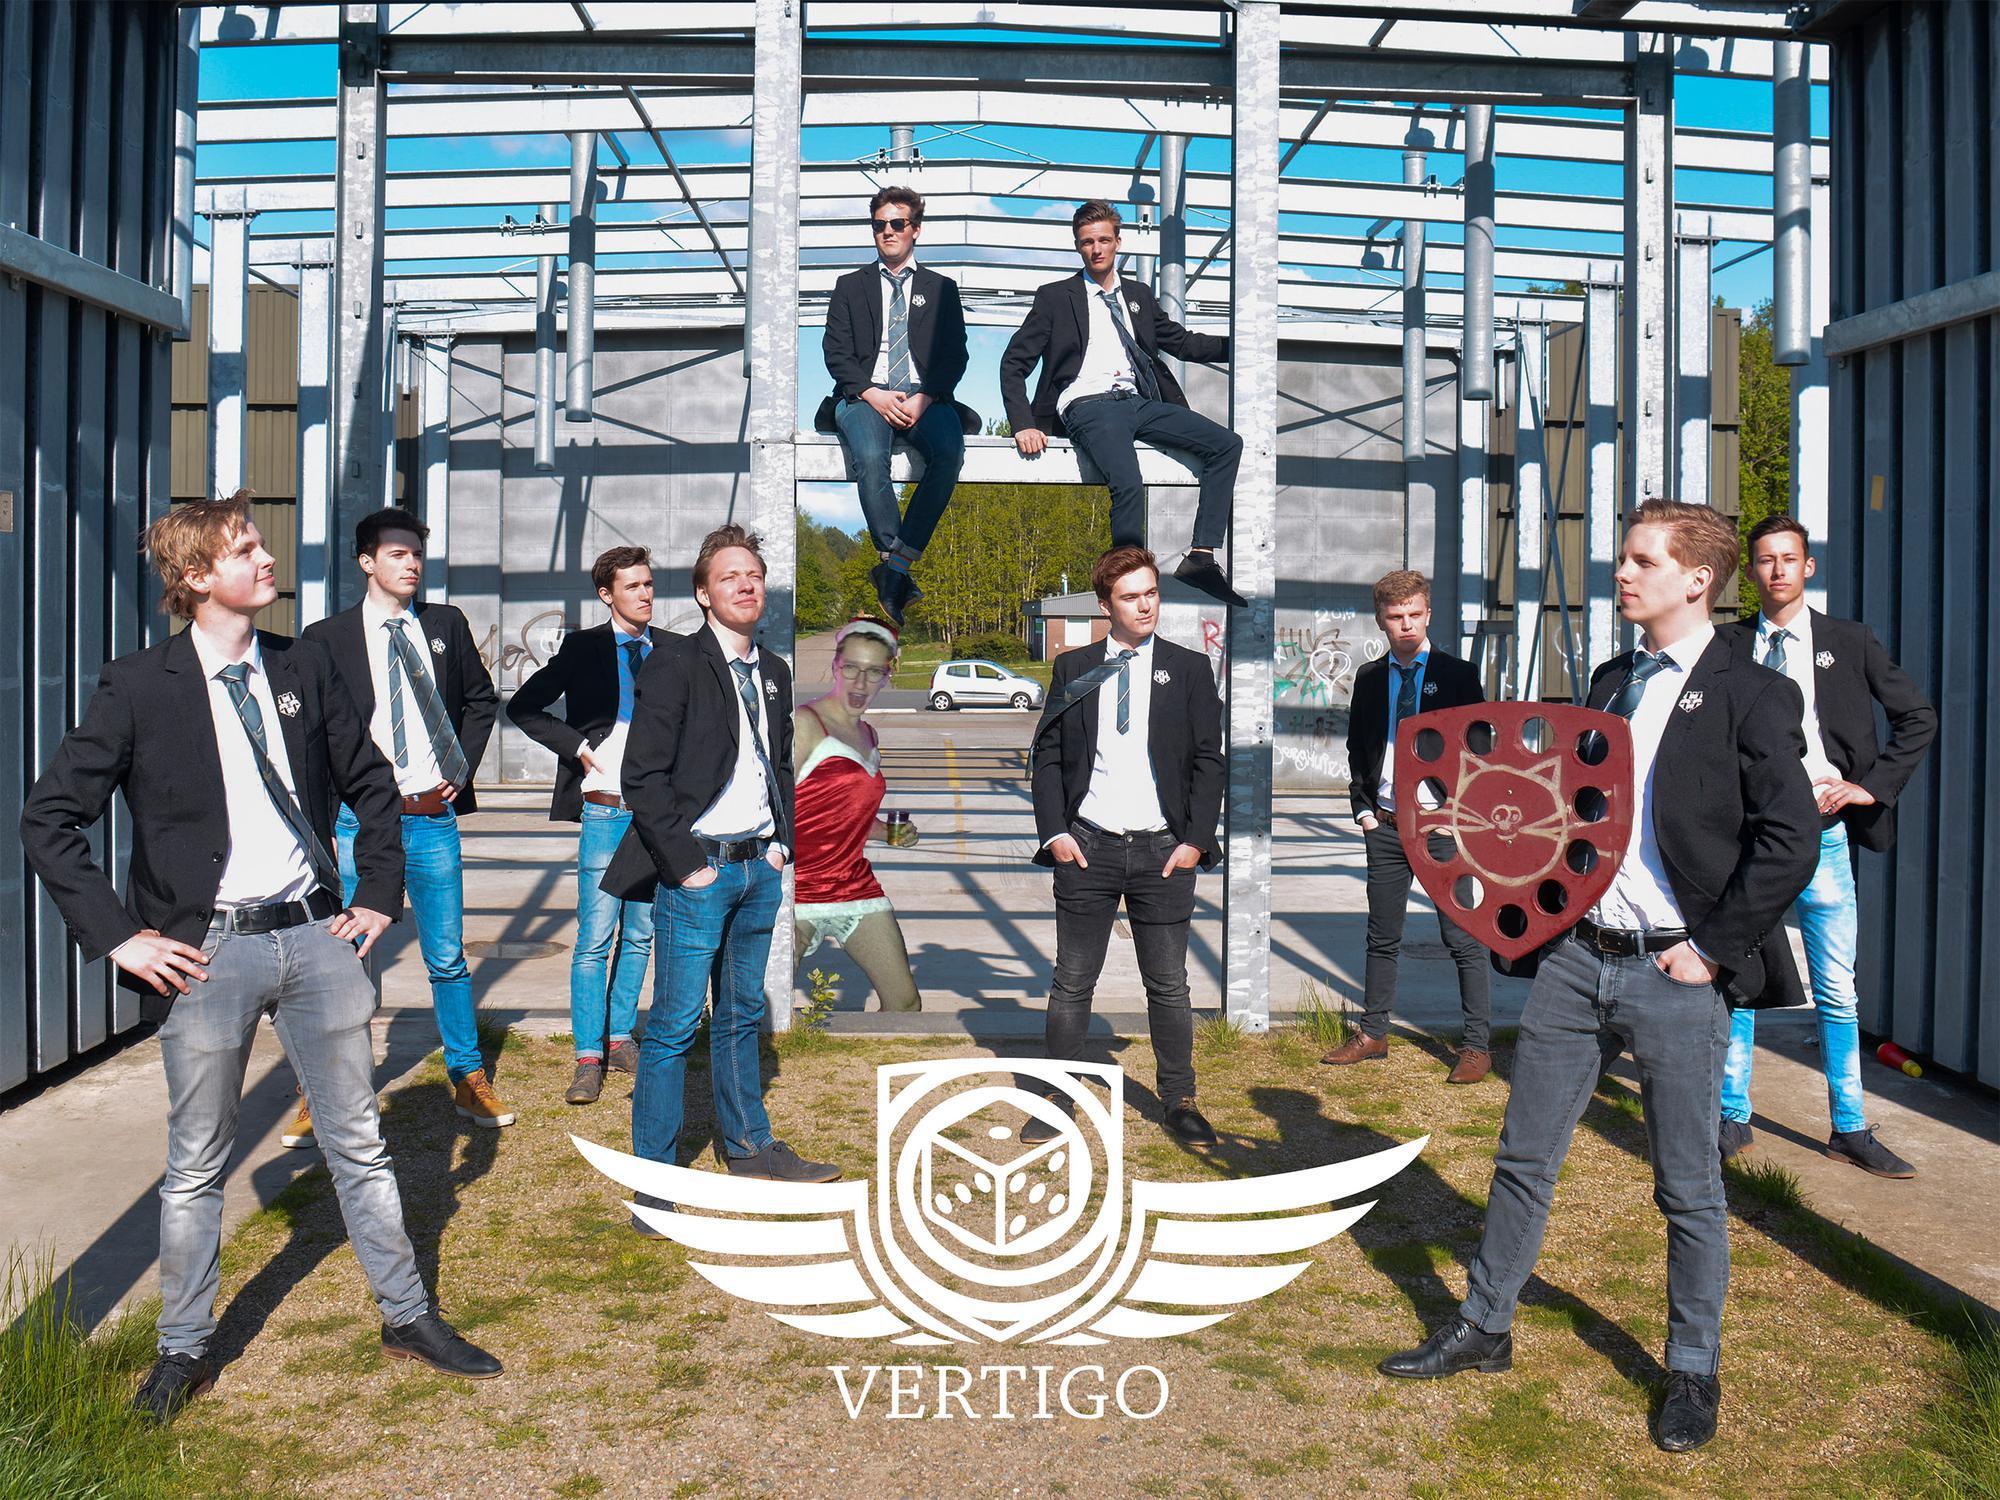 2017 - Vertigo